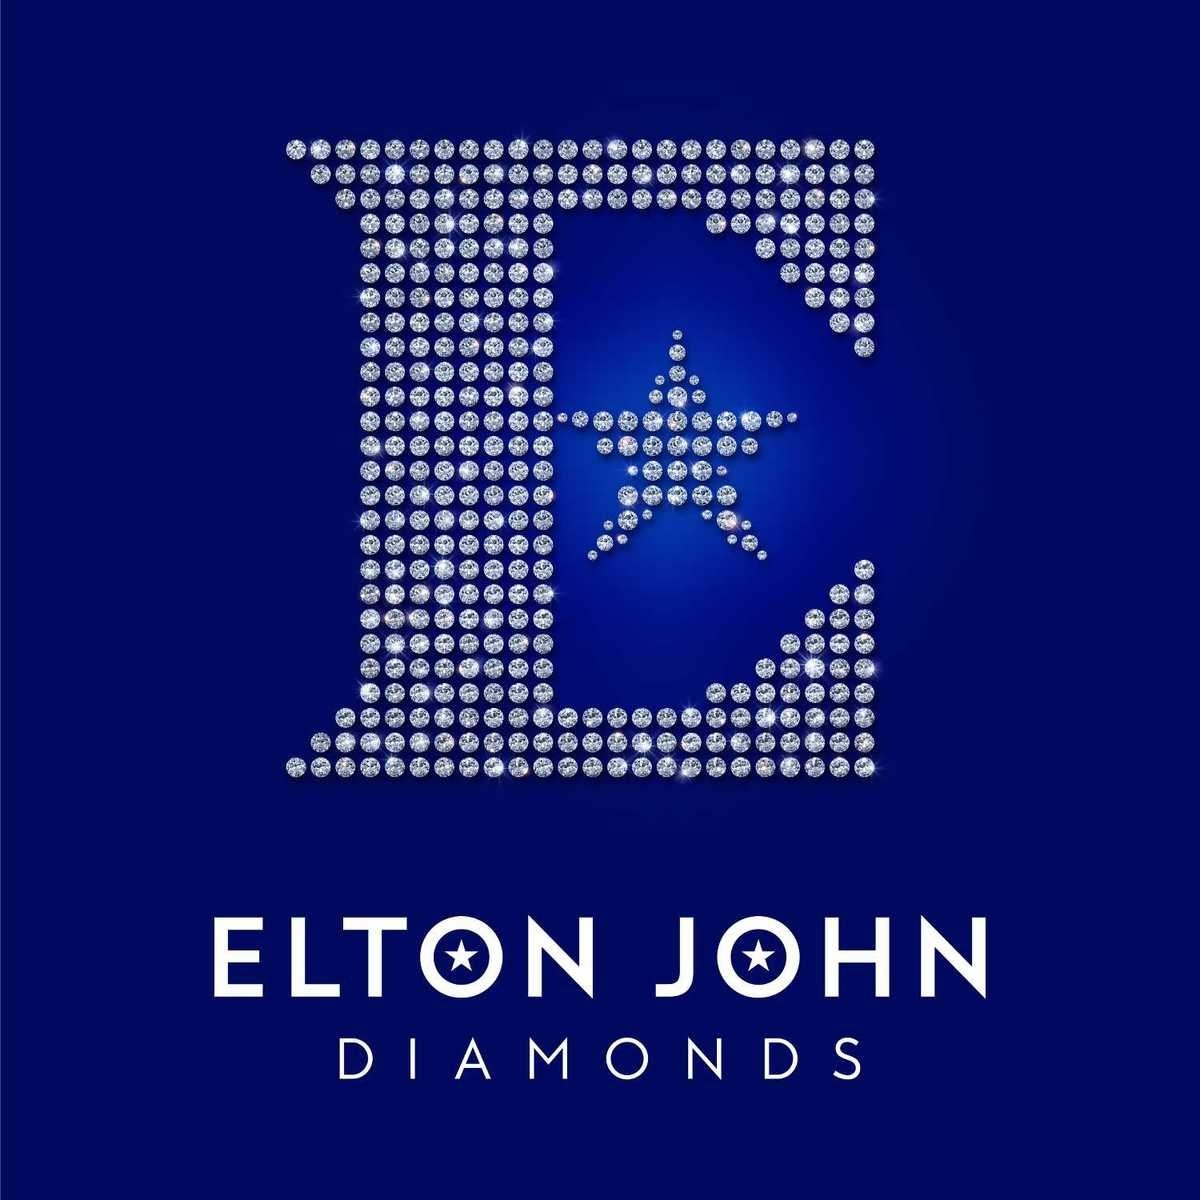 Buy Elton John Now!